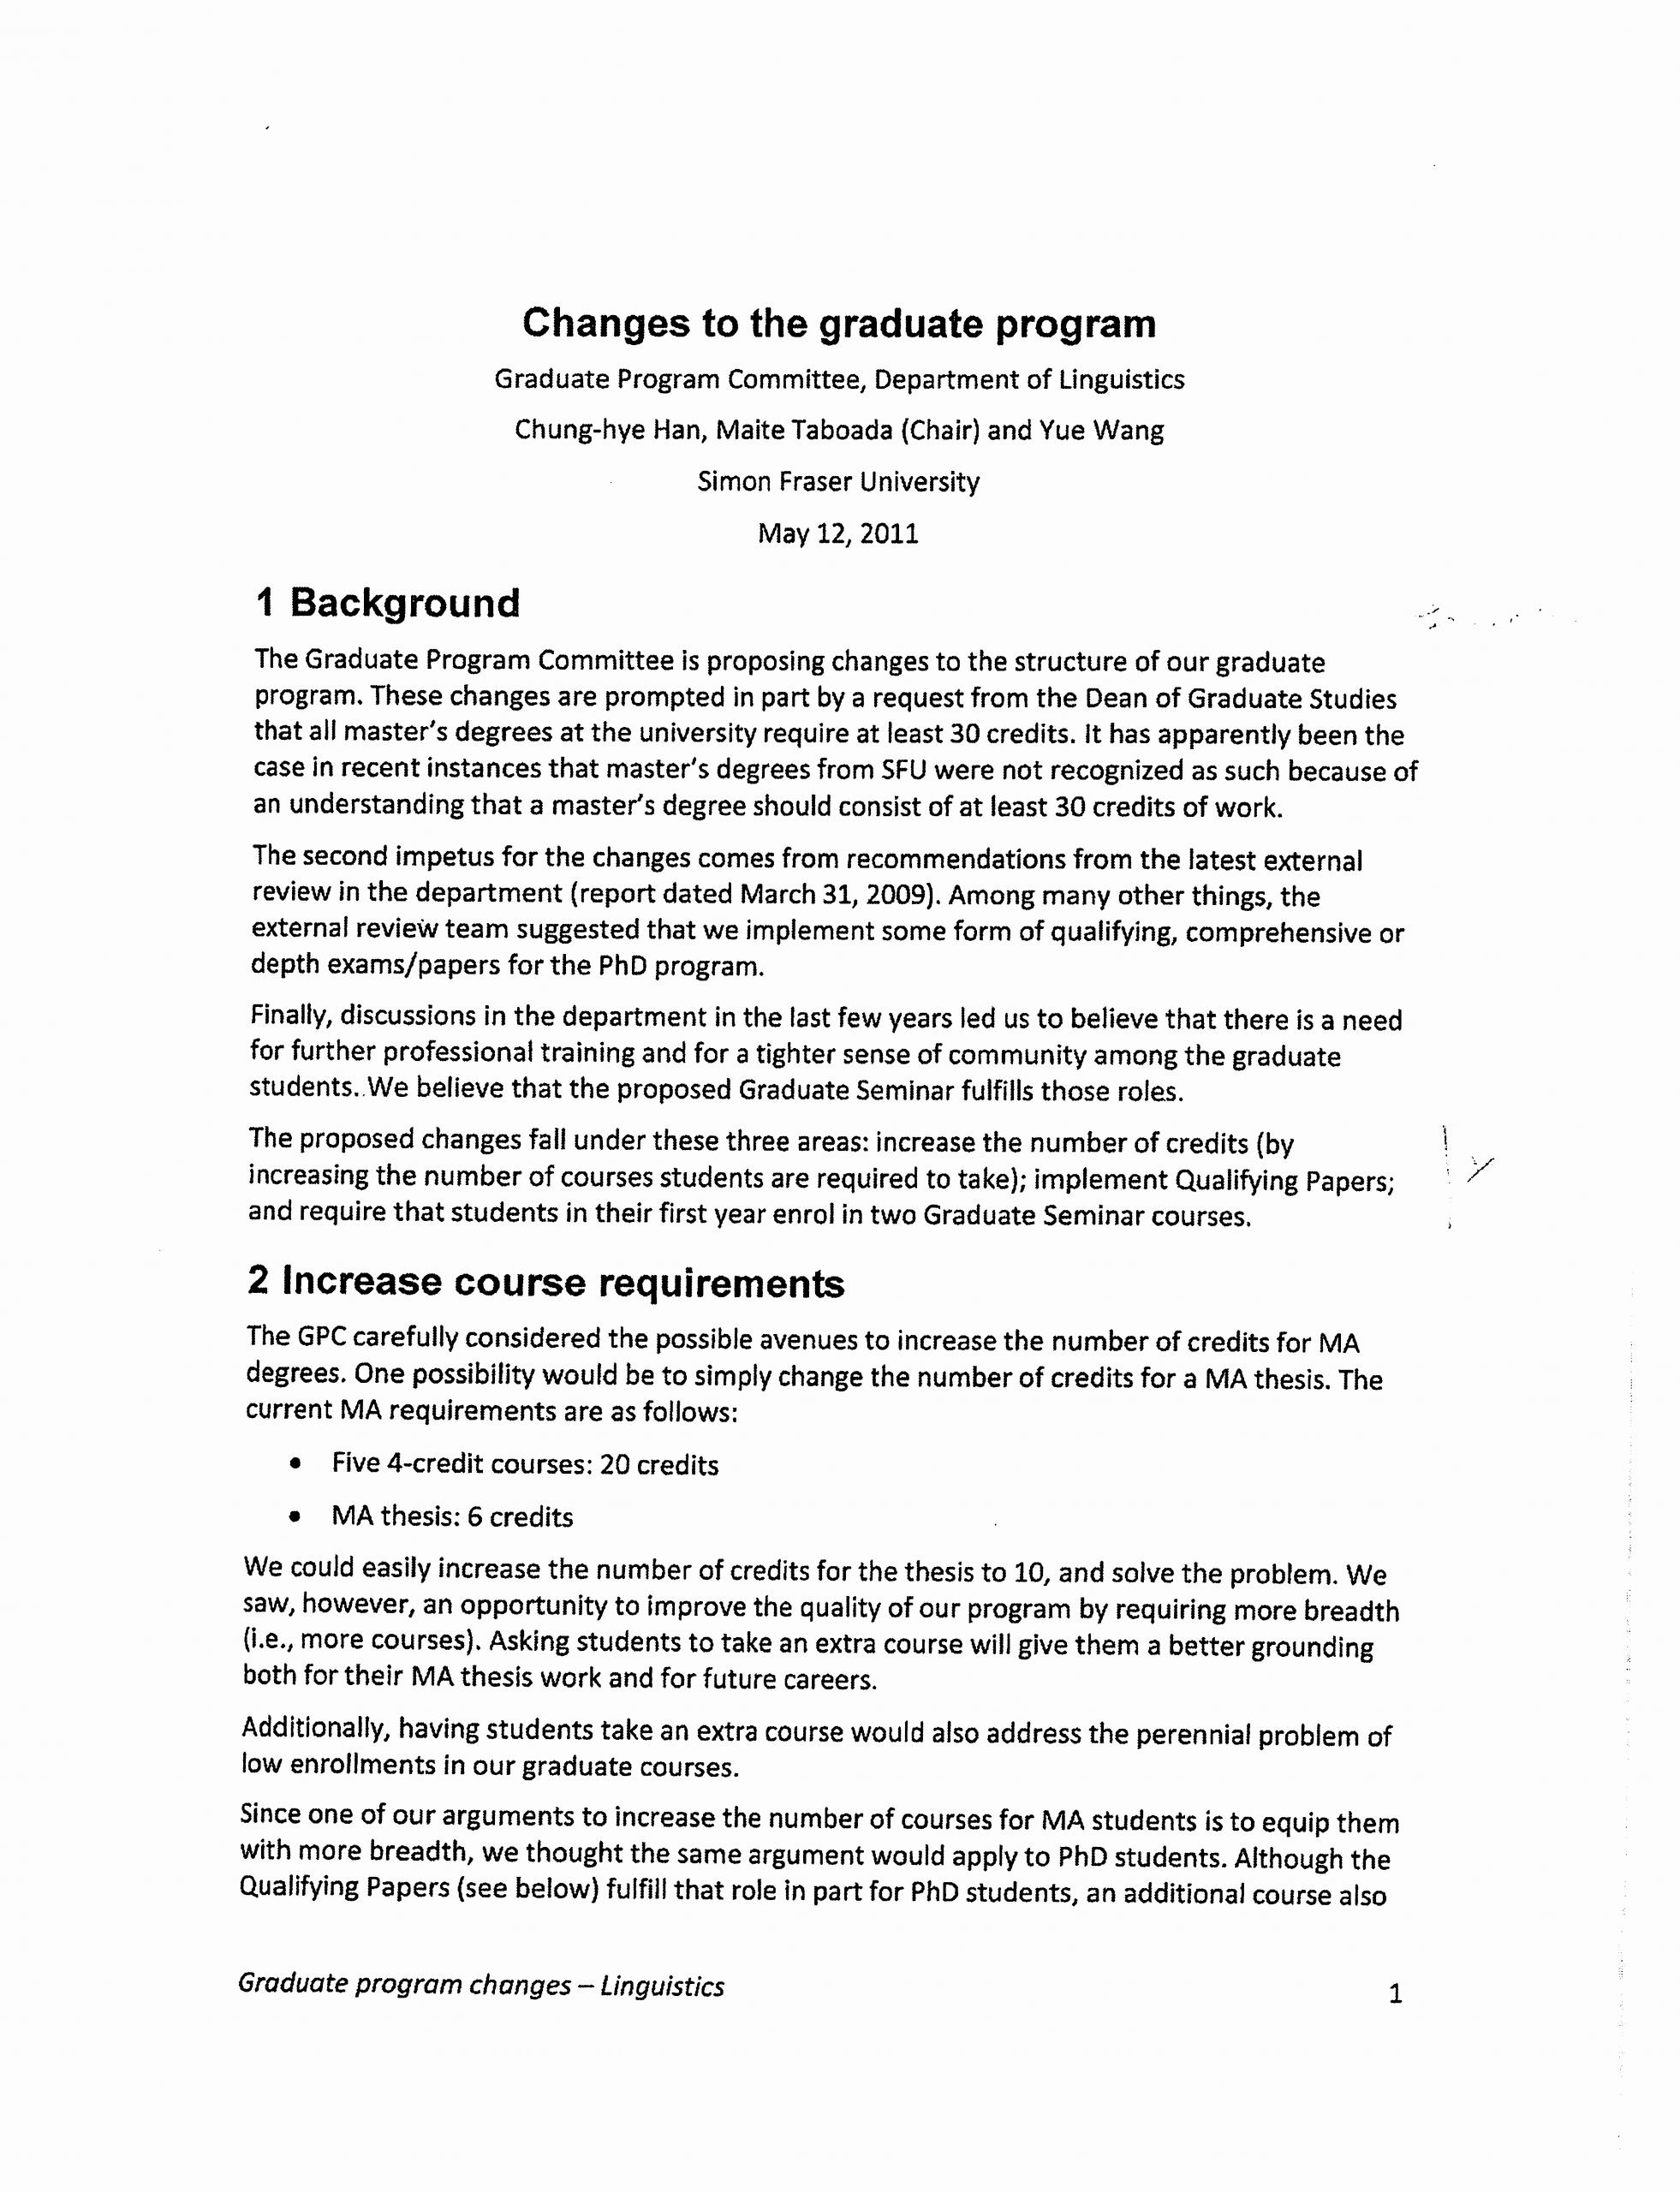 Letter Of Intent Sample for Grad School Best Of Letter Application Letter Intent Graduate School